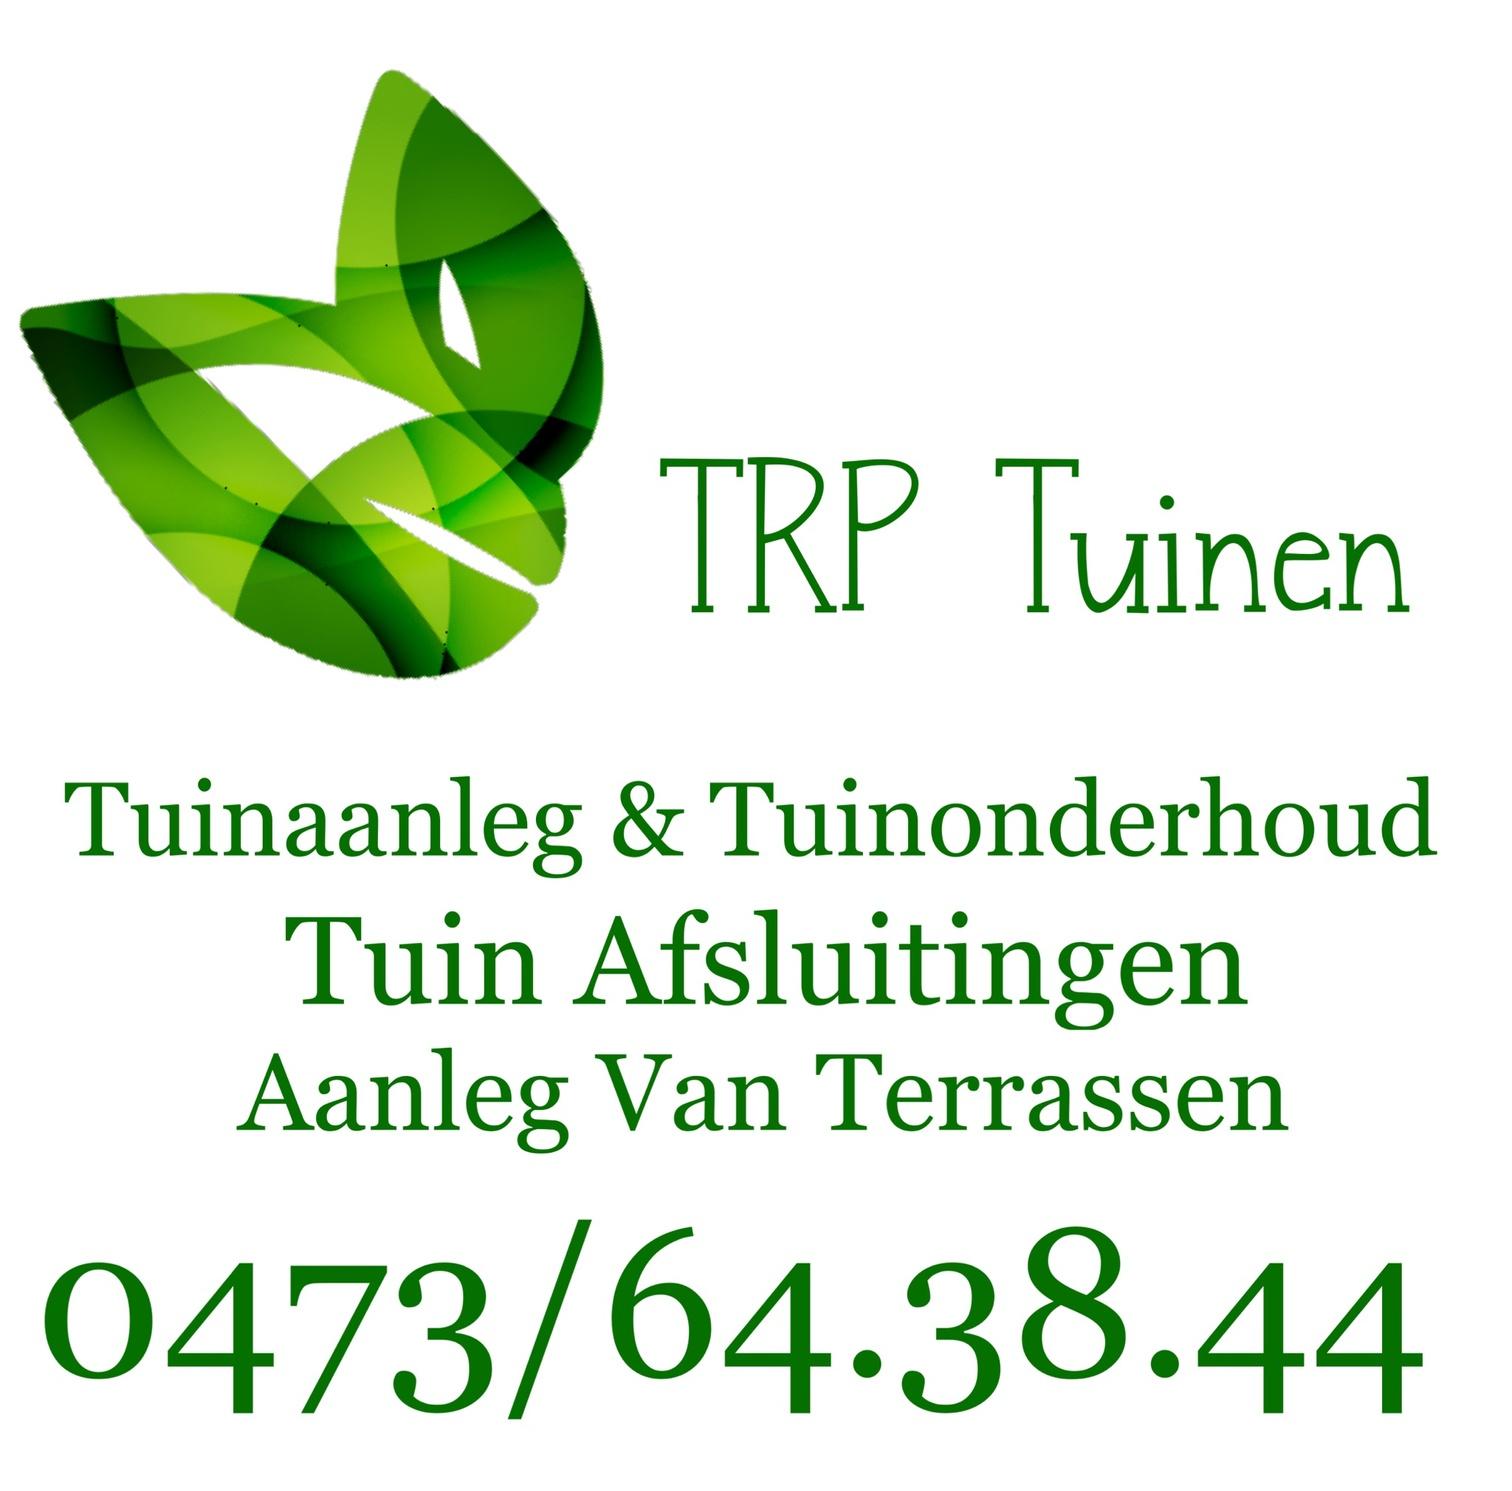 logo TRP tuinen